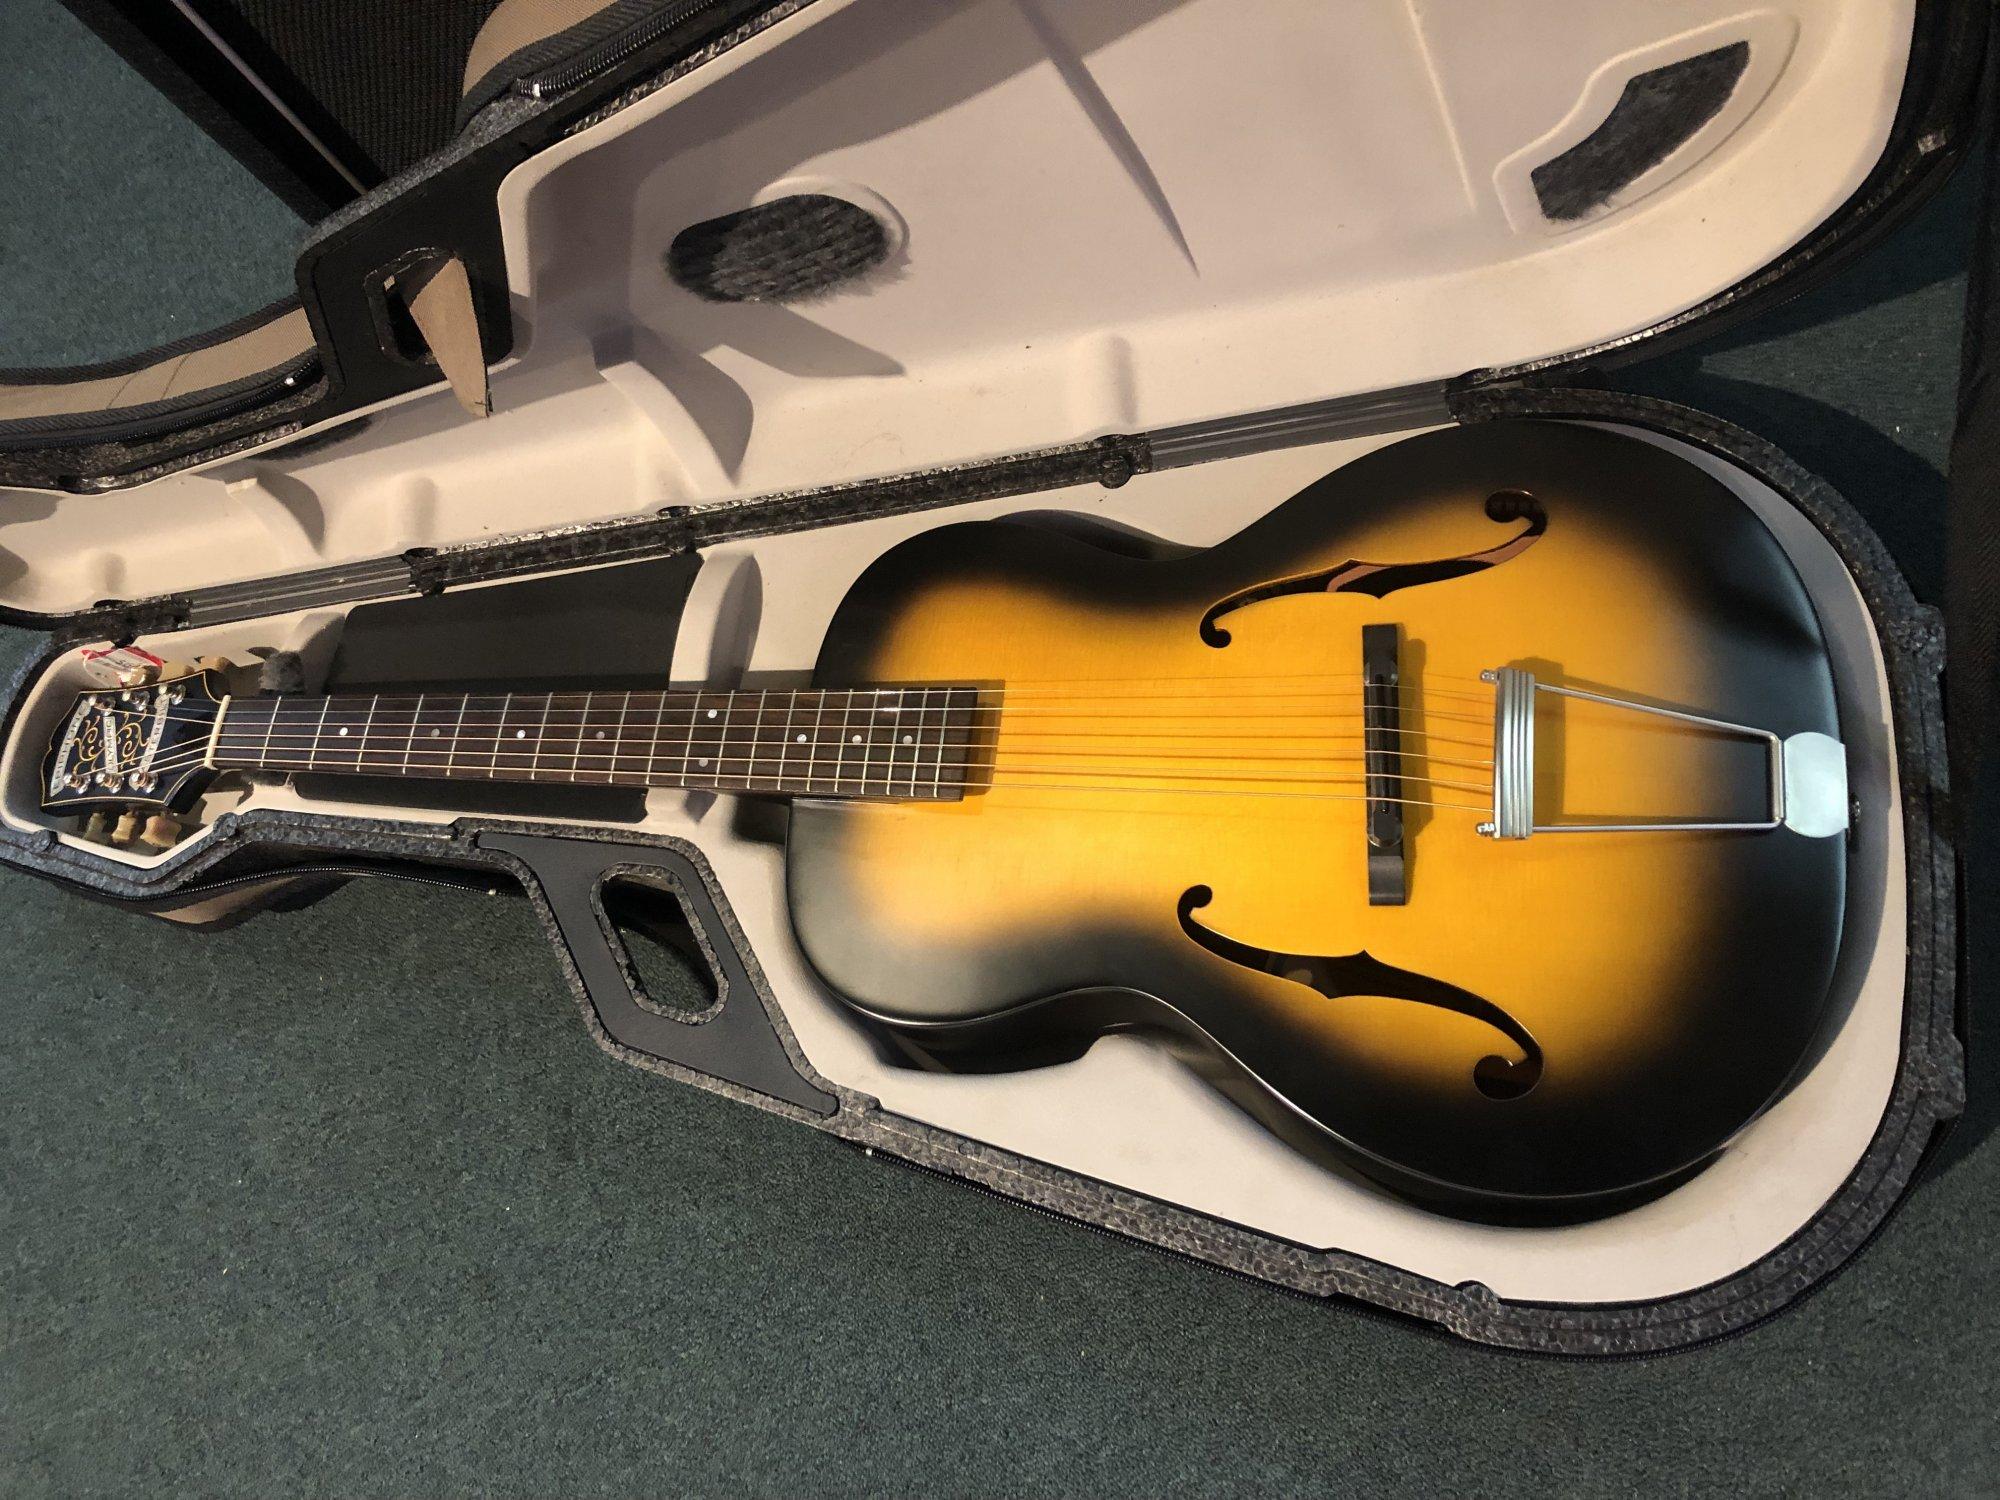 Tric Guitar Case